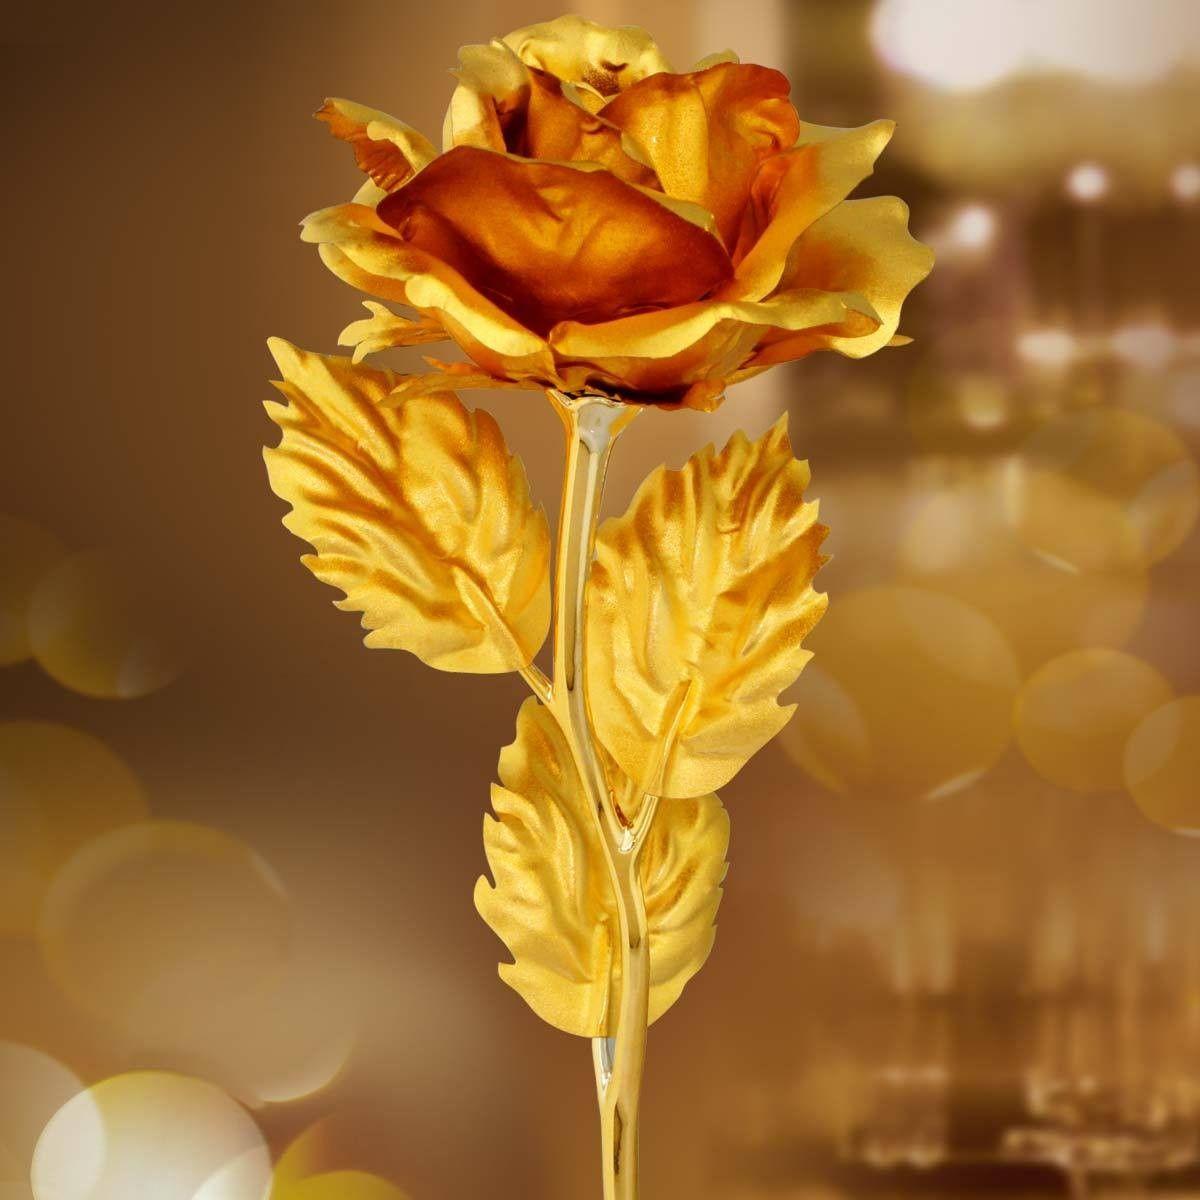 2018 Golden Rose For Valentine Day Artificial Flower Love Gold Dipped Creative Birthday Wedding Gift ValentineS Girls From Samaki